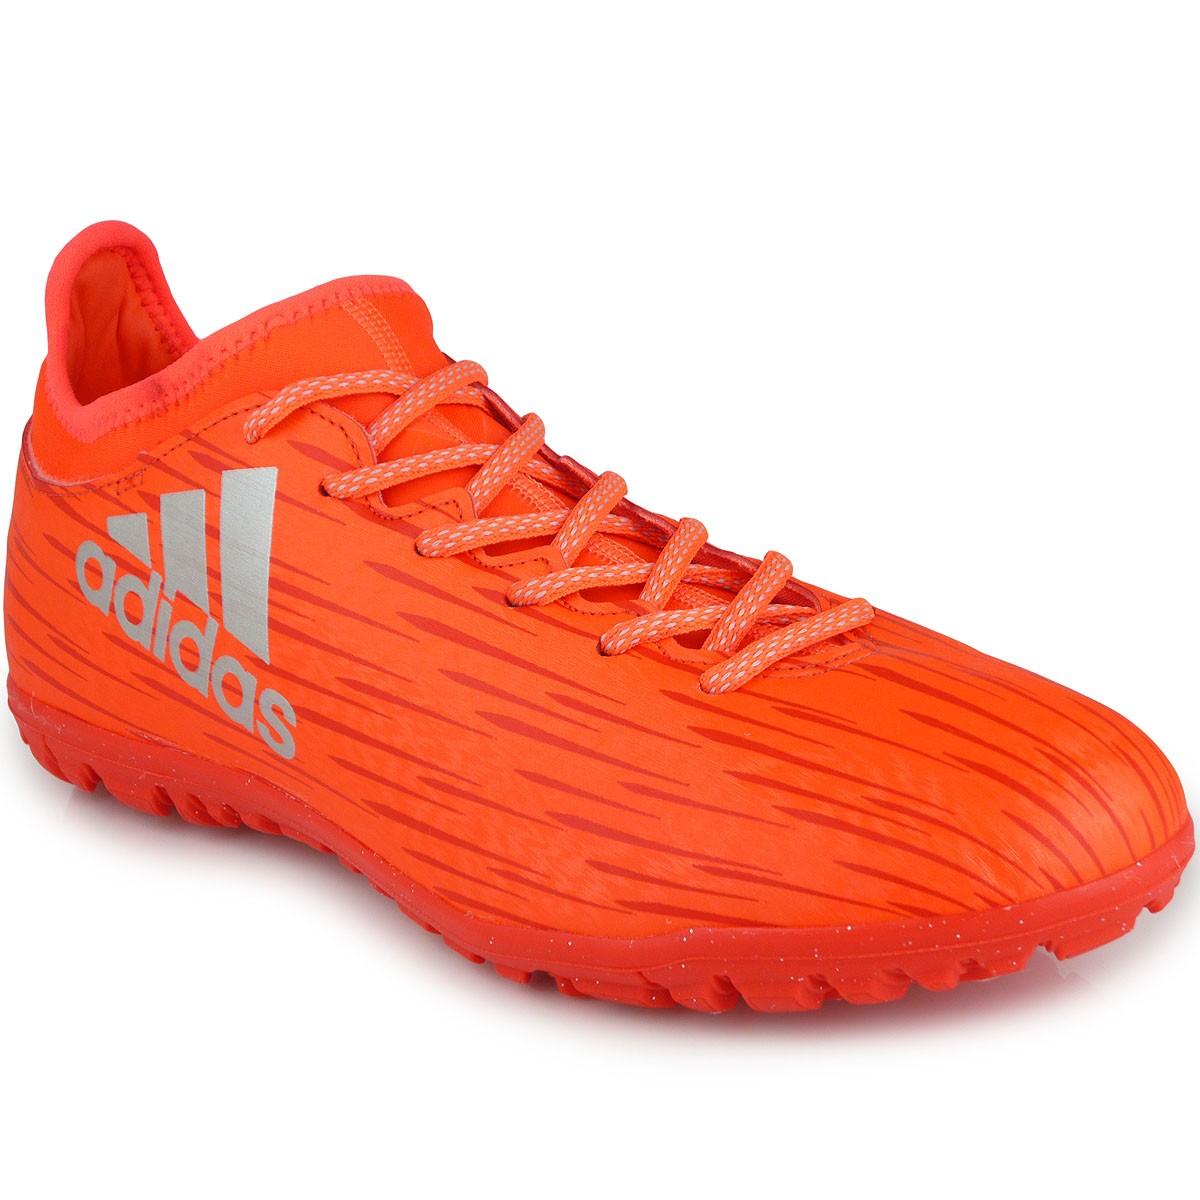 15adafa0ea Chuteira Adidas X 16.3 TF